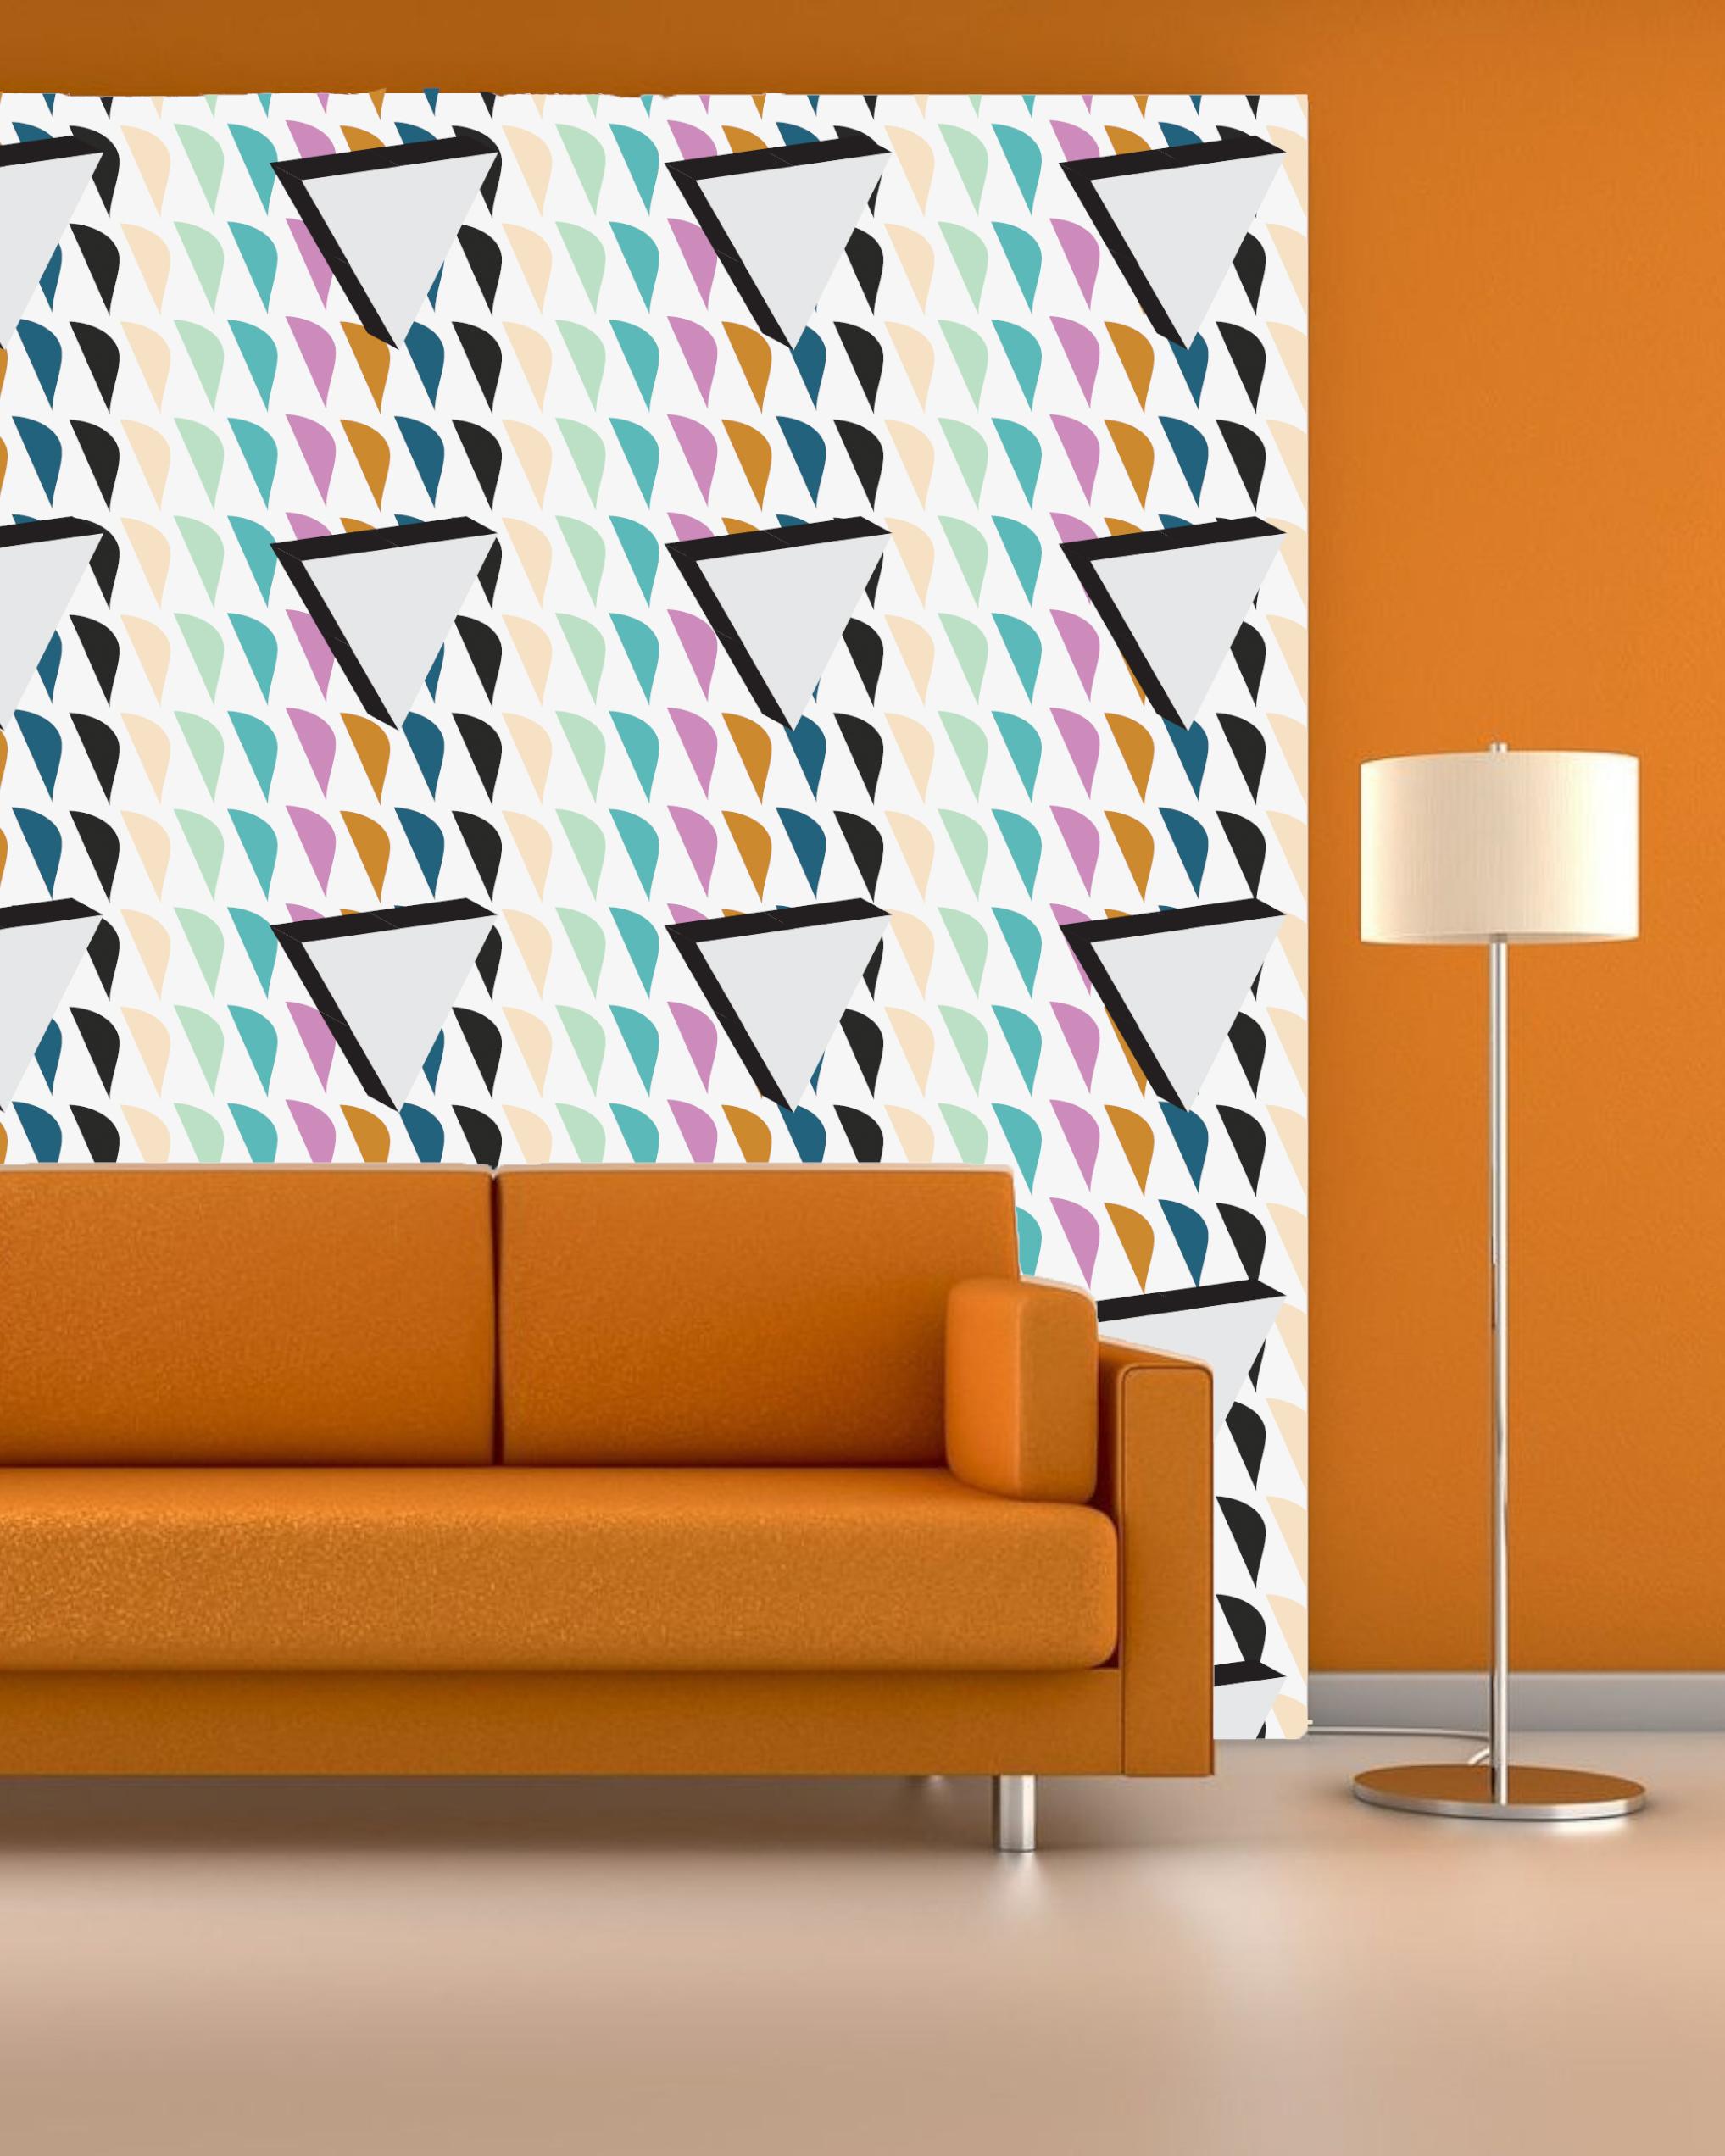 jadesign-wallpaper-triangulum3.jpg